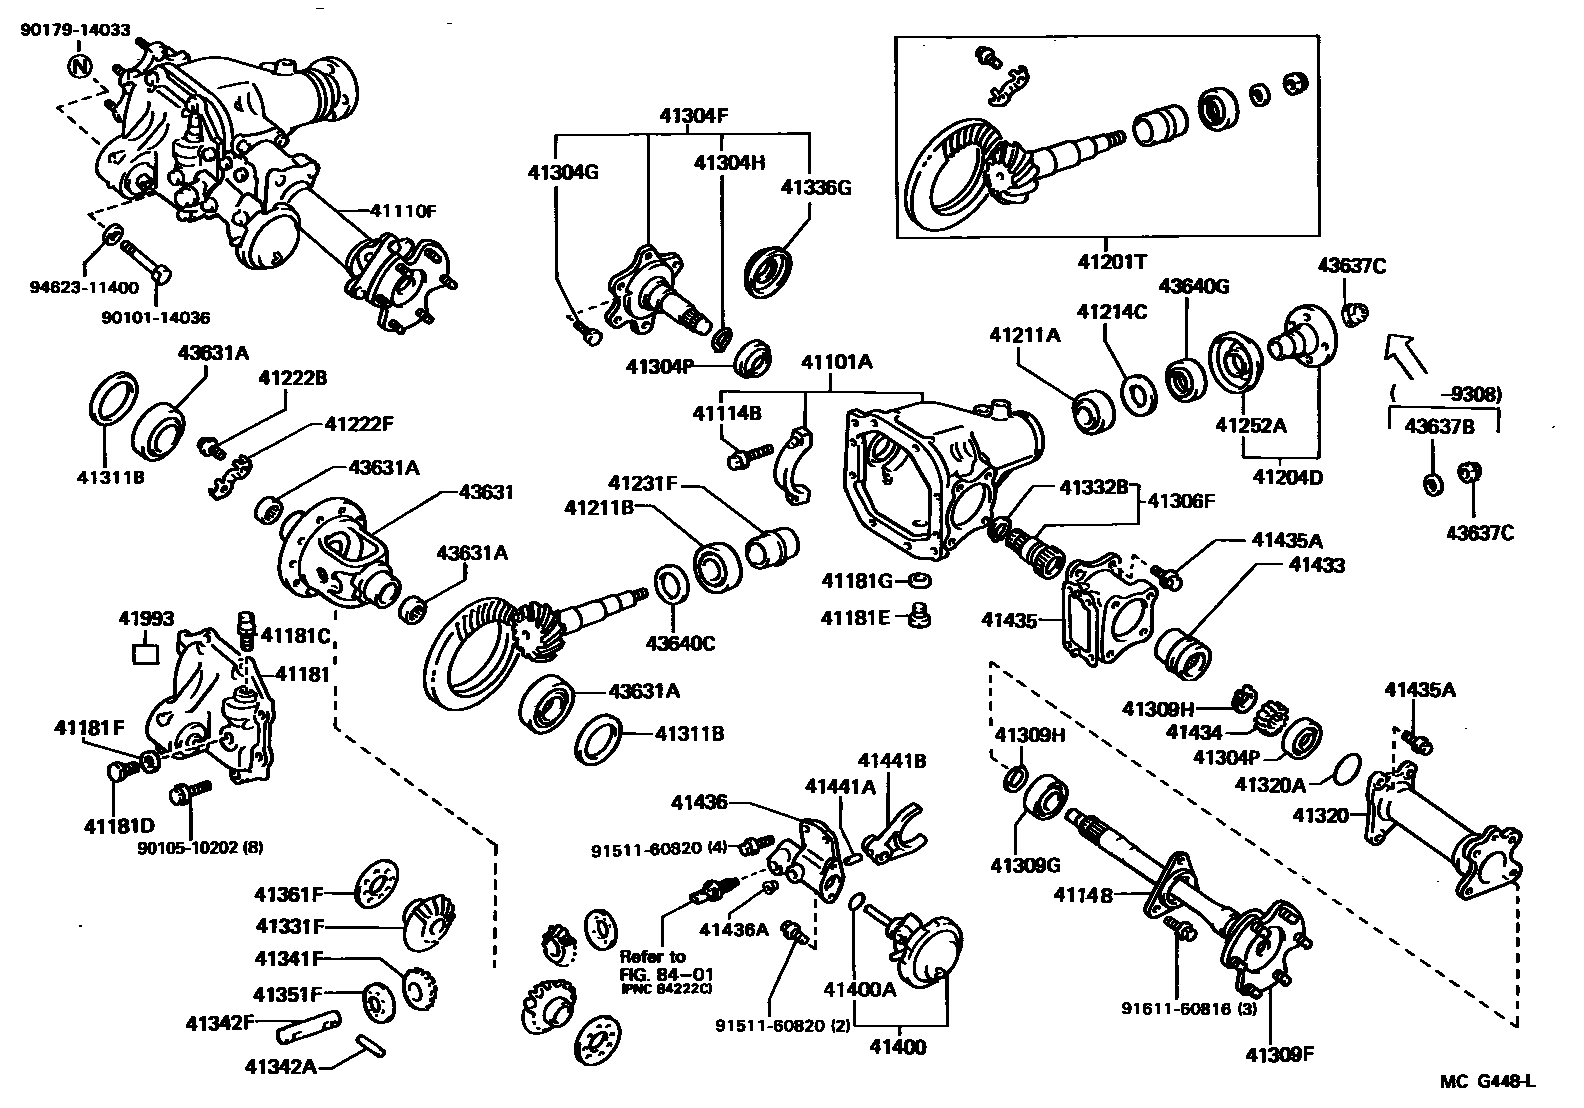 [FPER_4992]  XL_2586] 2002 Tundra Wiring Diagram Furthermore 1997 Toyota Ta A Wiring  Diagram | 2002 Tundra Wiring Diagram Furthermore 1997 Toyota Ta A |  | Erek Habi Inrebe Mohammedshrine Librar Wiring 101